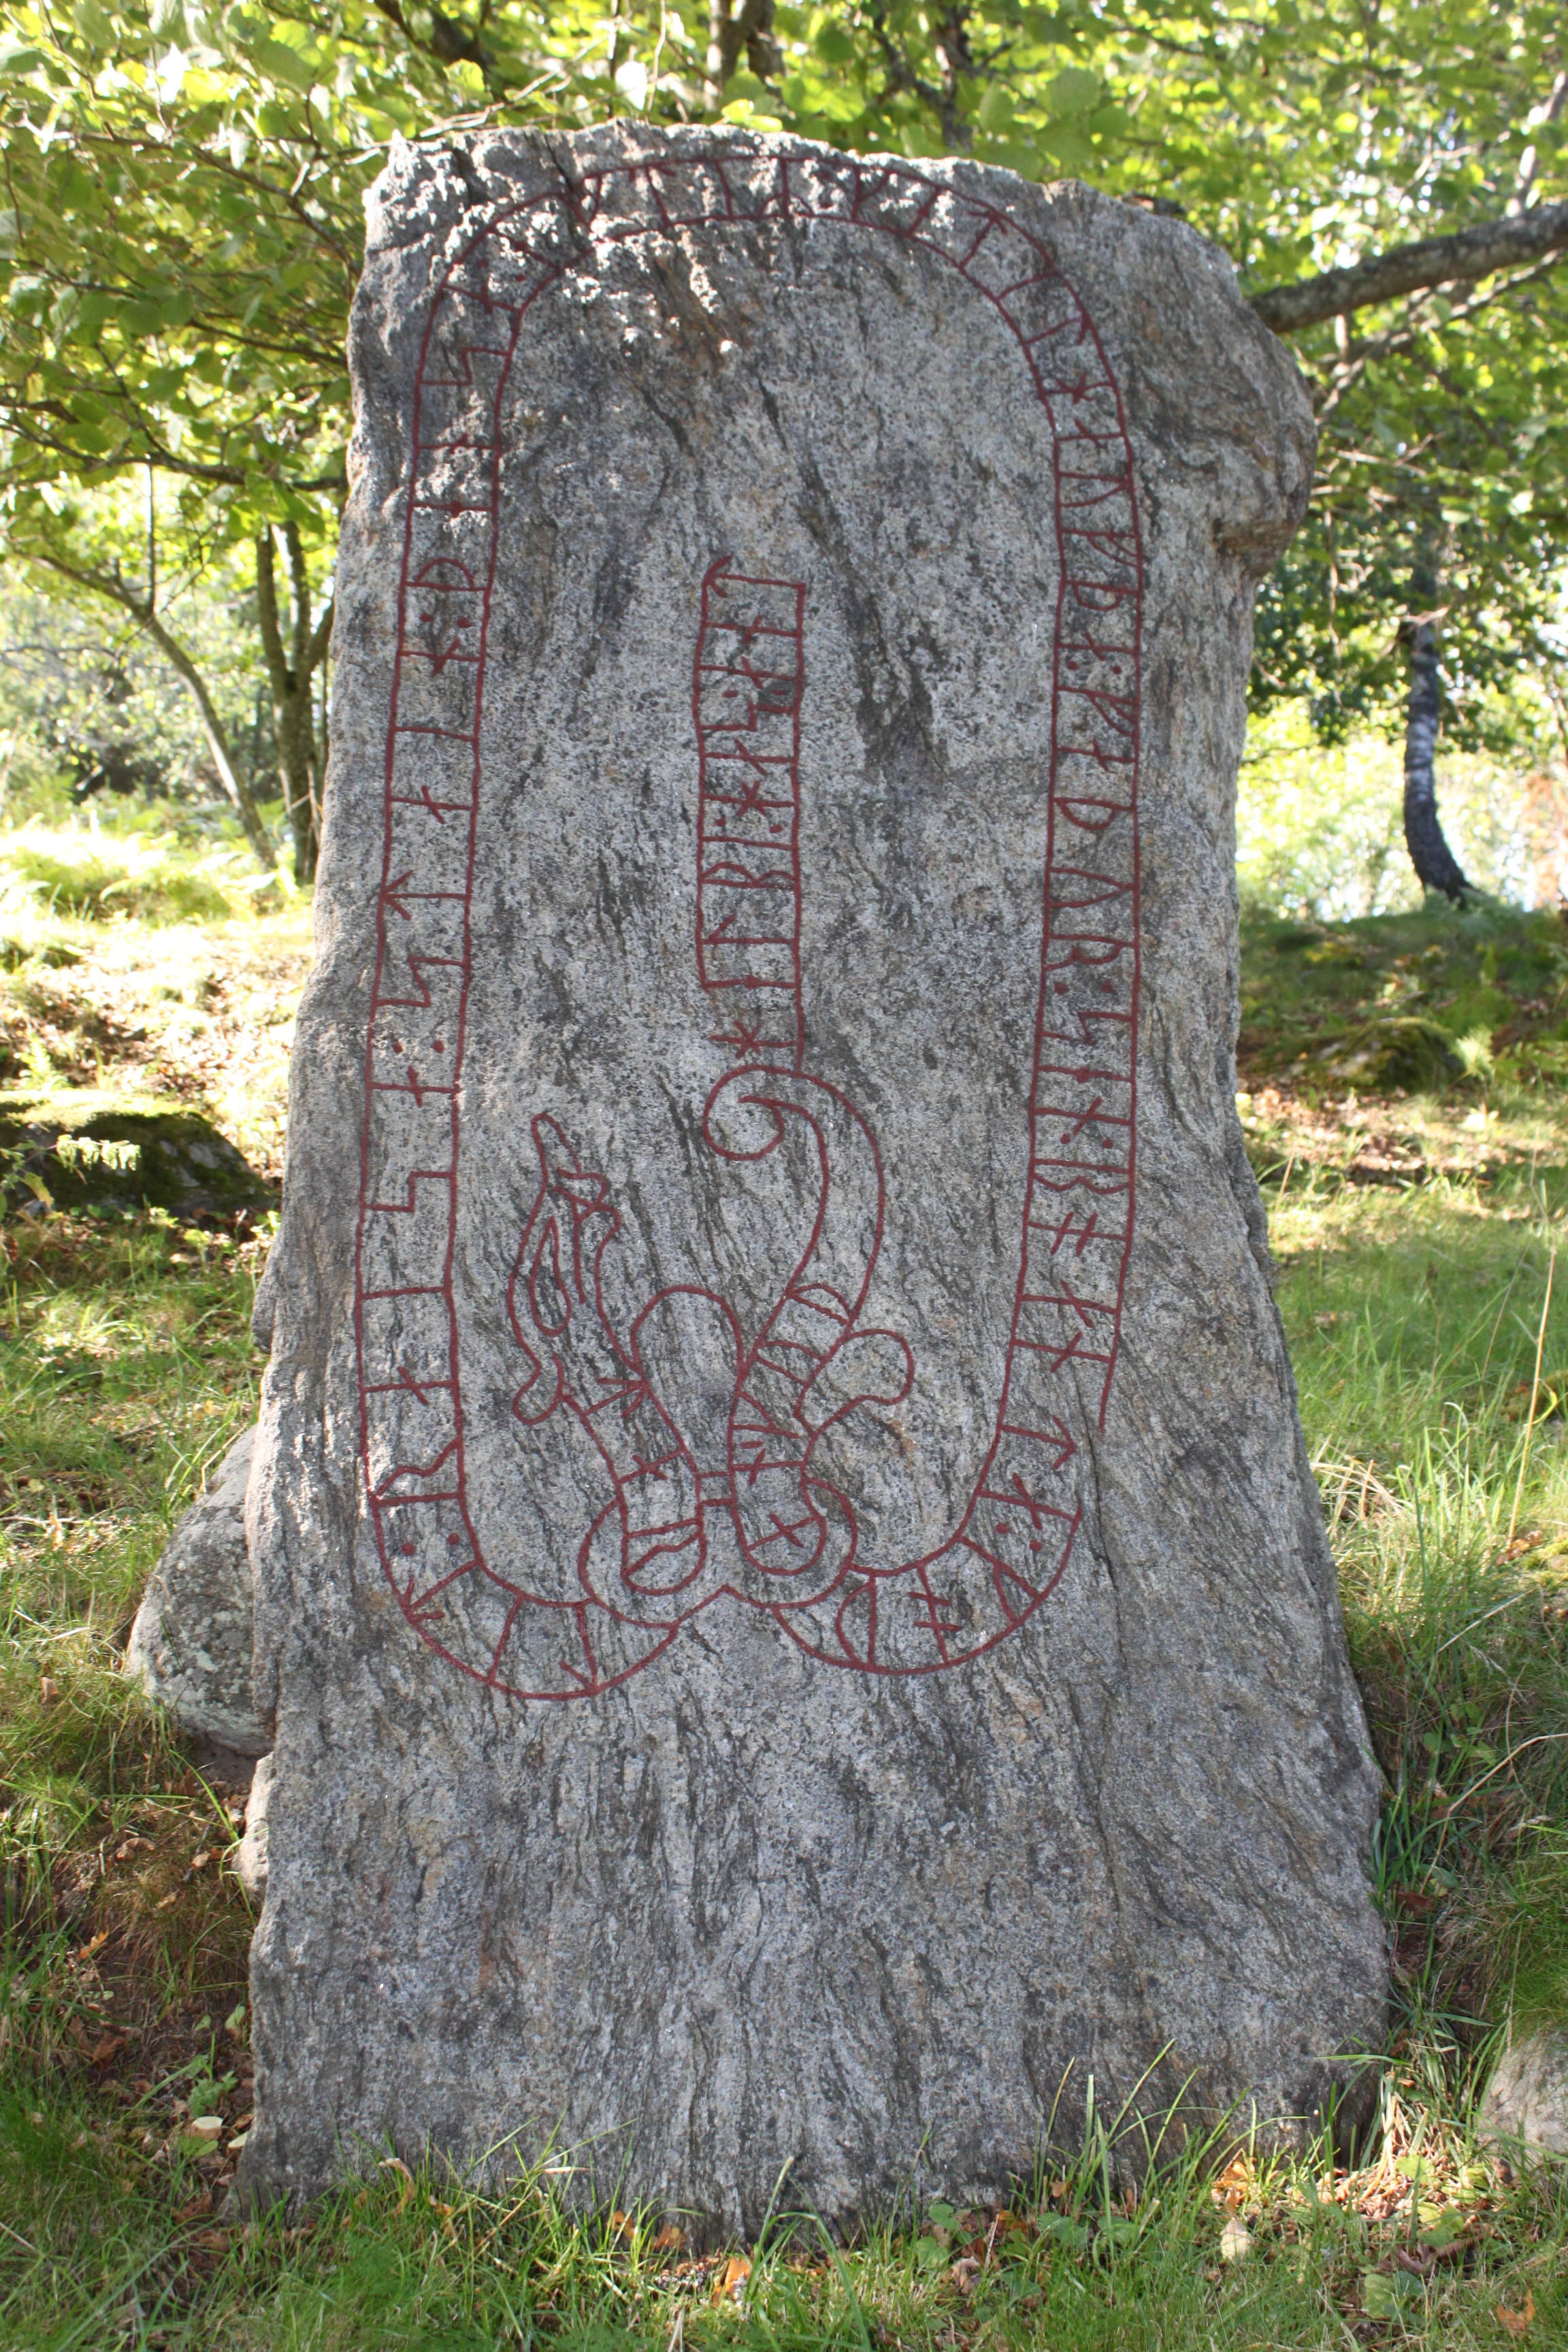 Sengustaviansk stol med lotusstavar i ryggen, frn sterby i